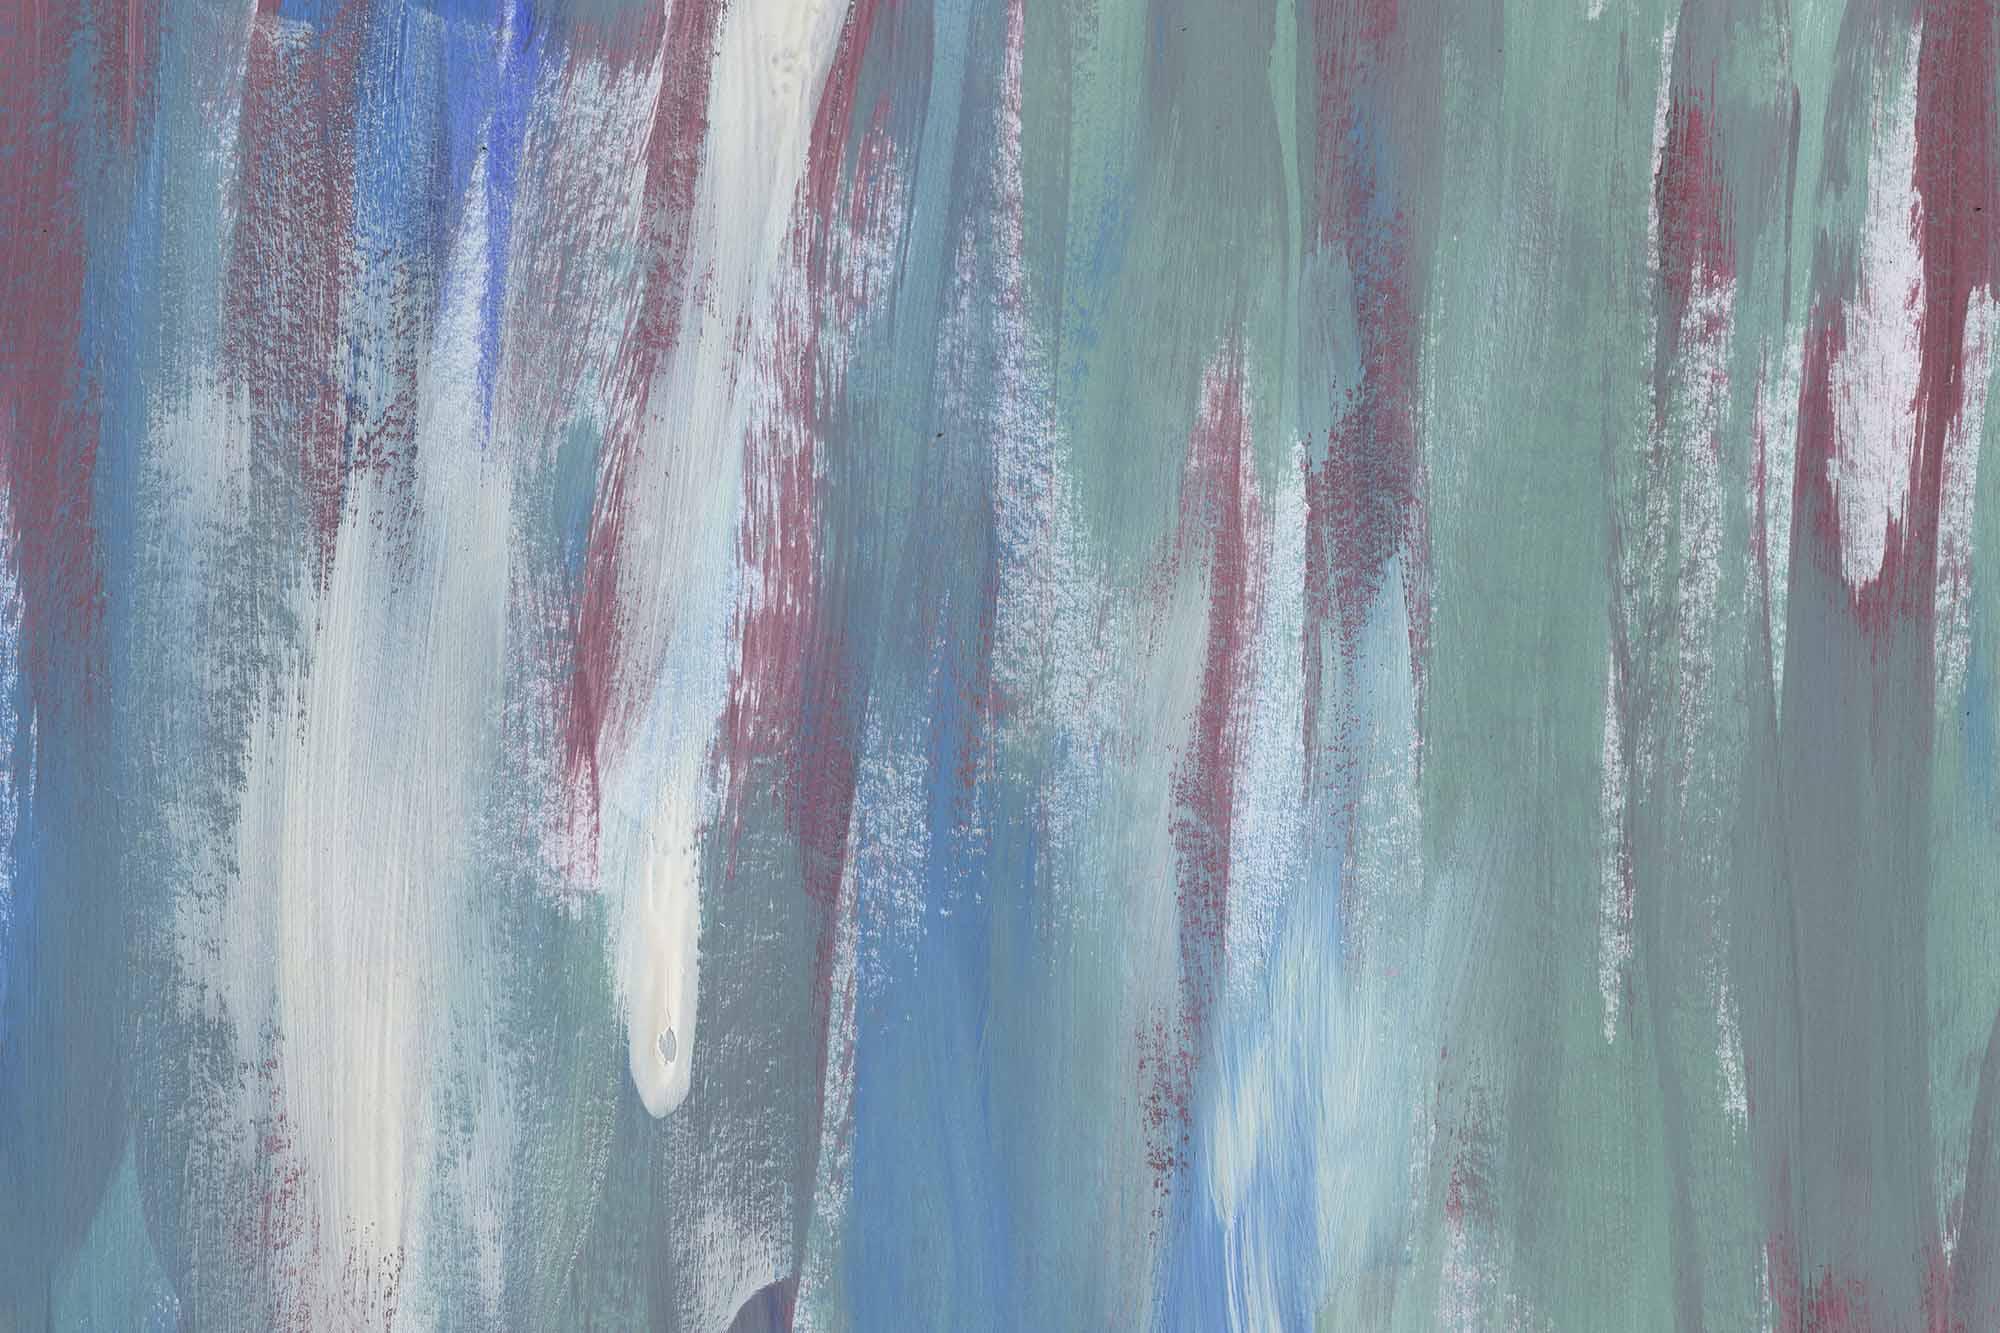 Modern Abstract Acrylic Textures 4